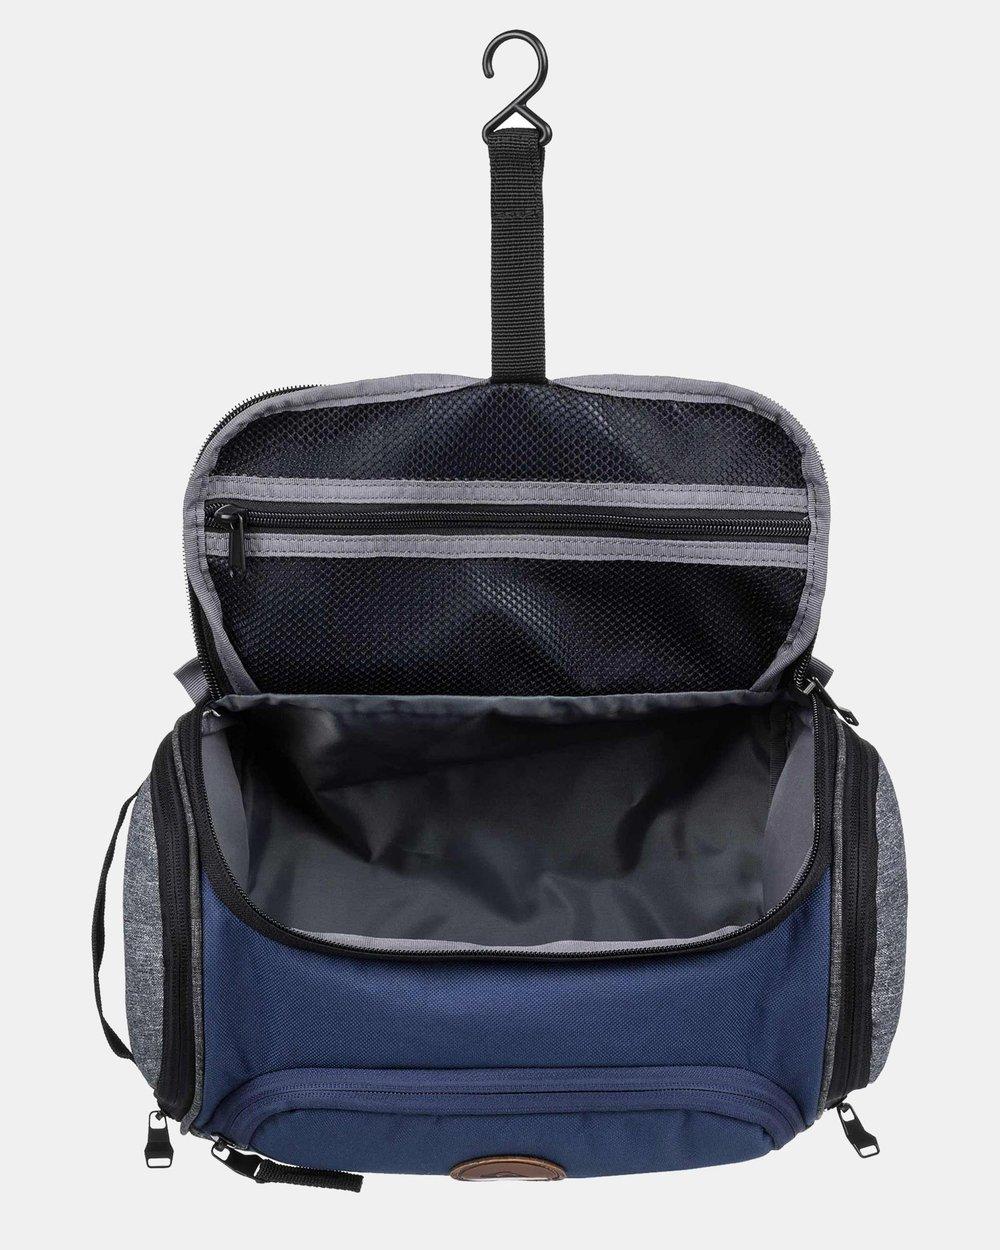 3d725bf97578 Capsule Travel Toiletries Bag by Quiksilver Online